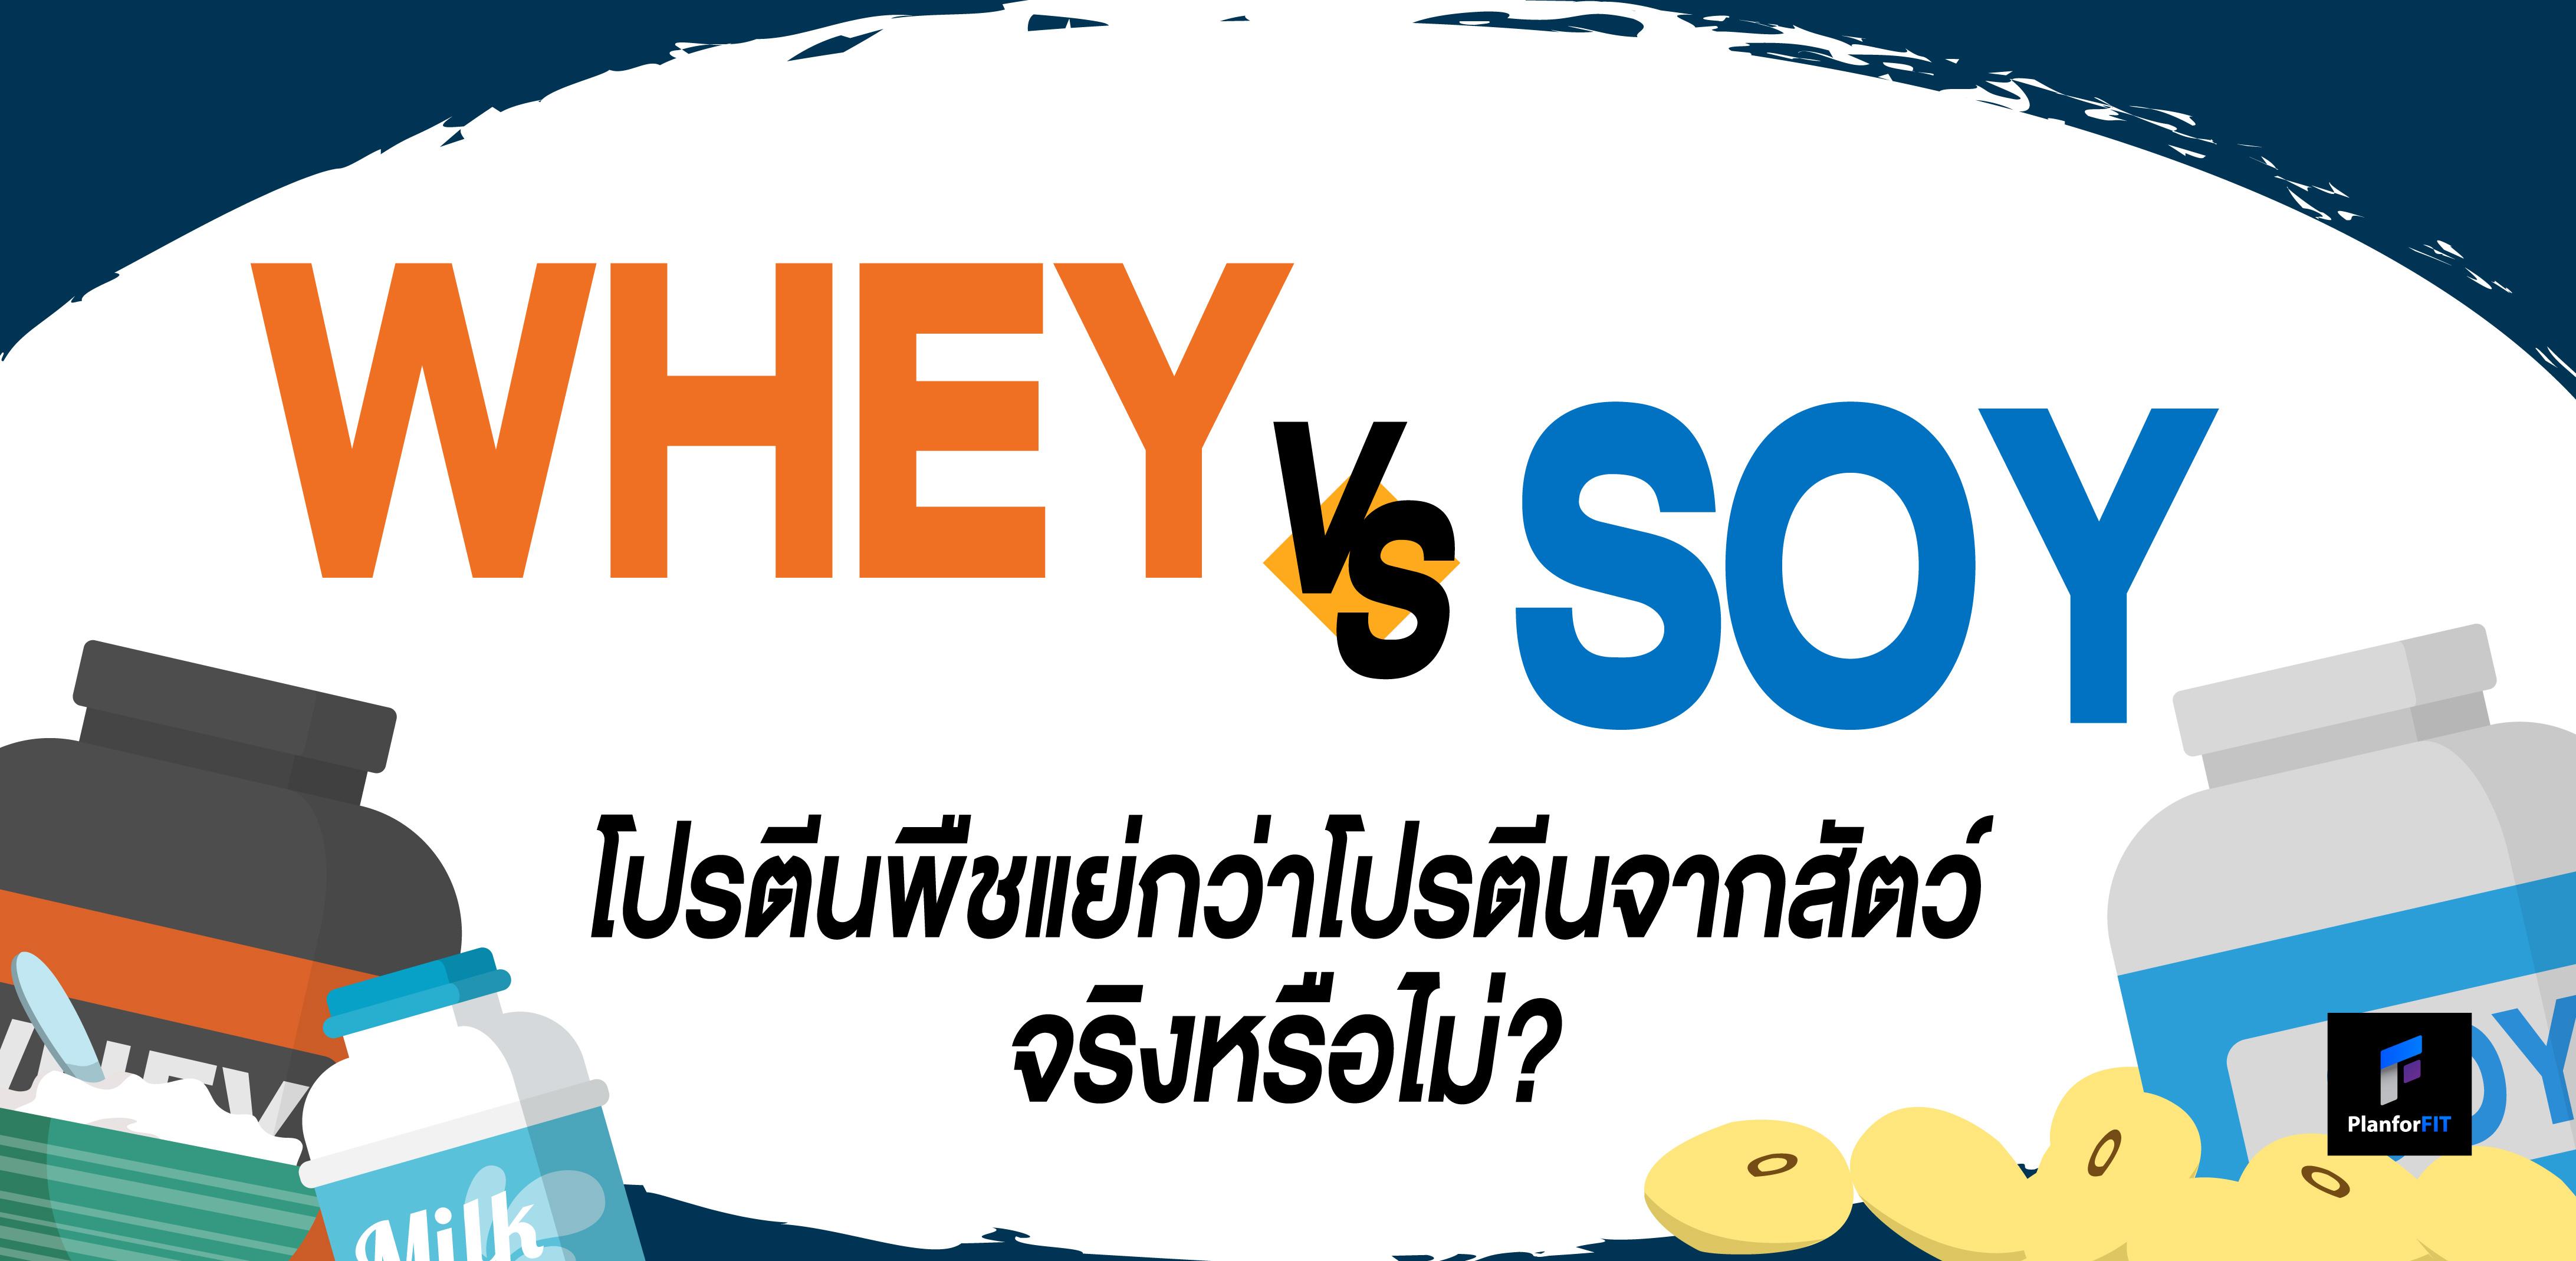 Whey vs Soy: โปรตีนจากพืชแย่กว่าโปรตีนจากสัตว์ จริงหรือไม่?